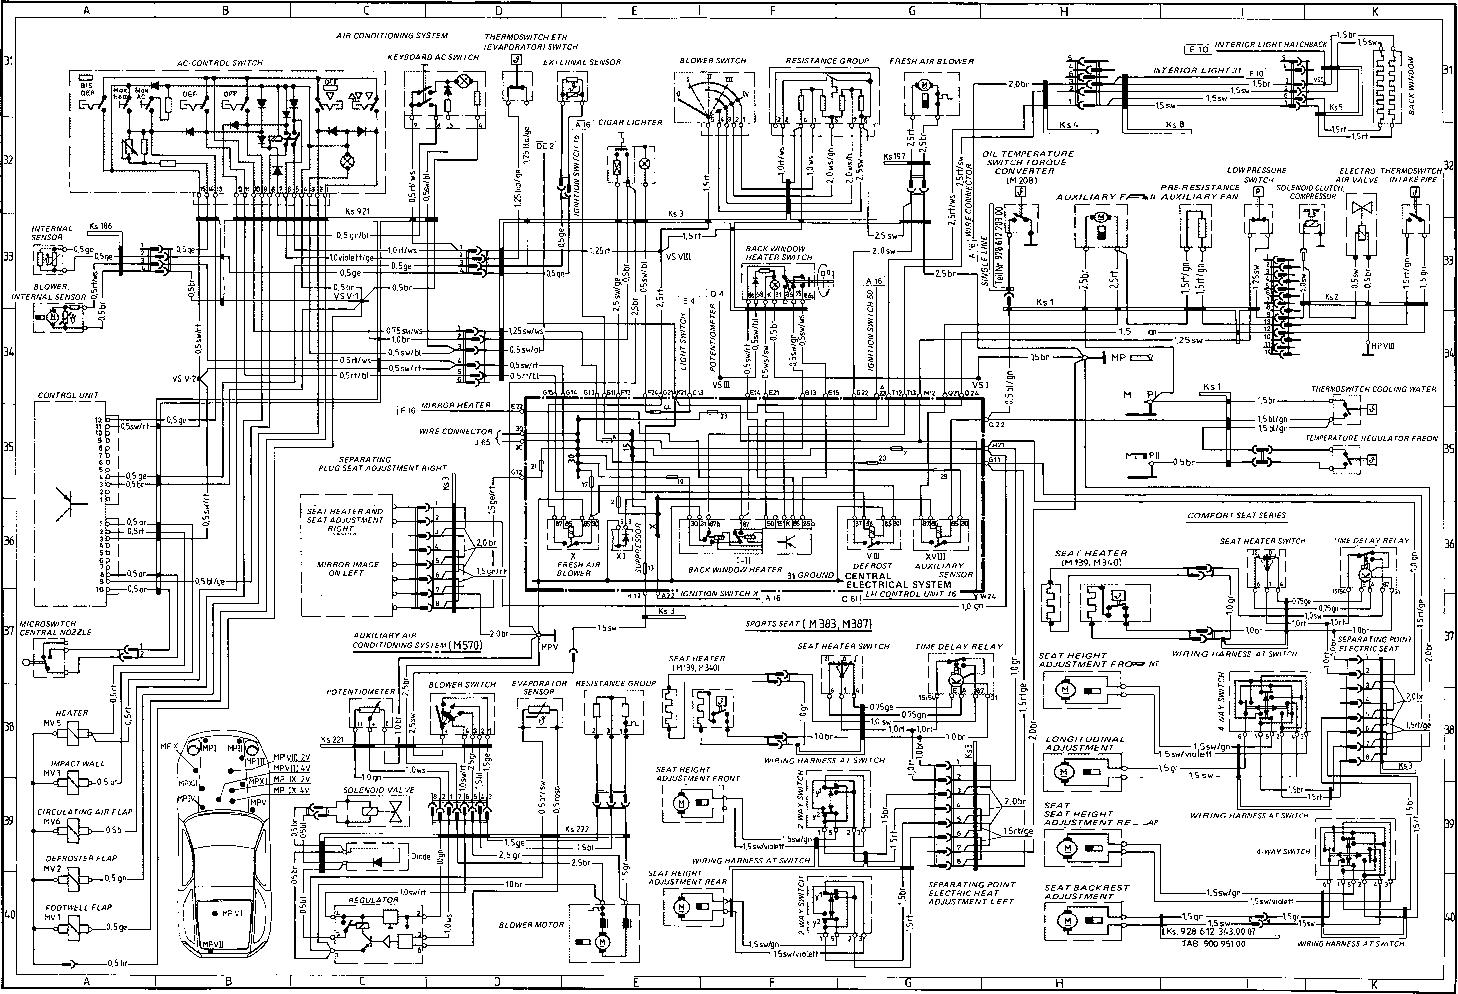 Schema Electrique Porsche 924 Turbo